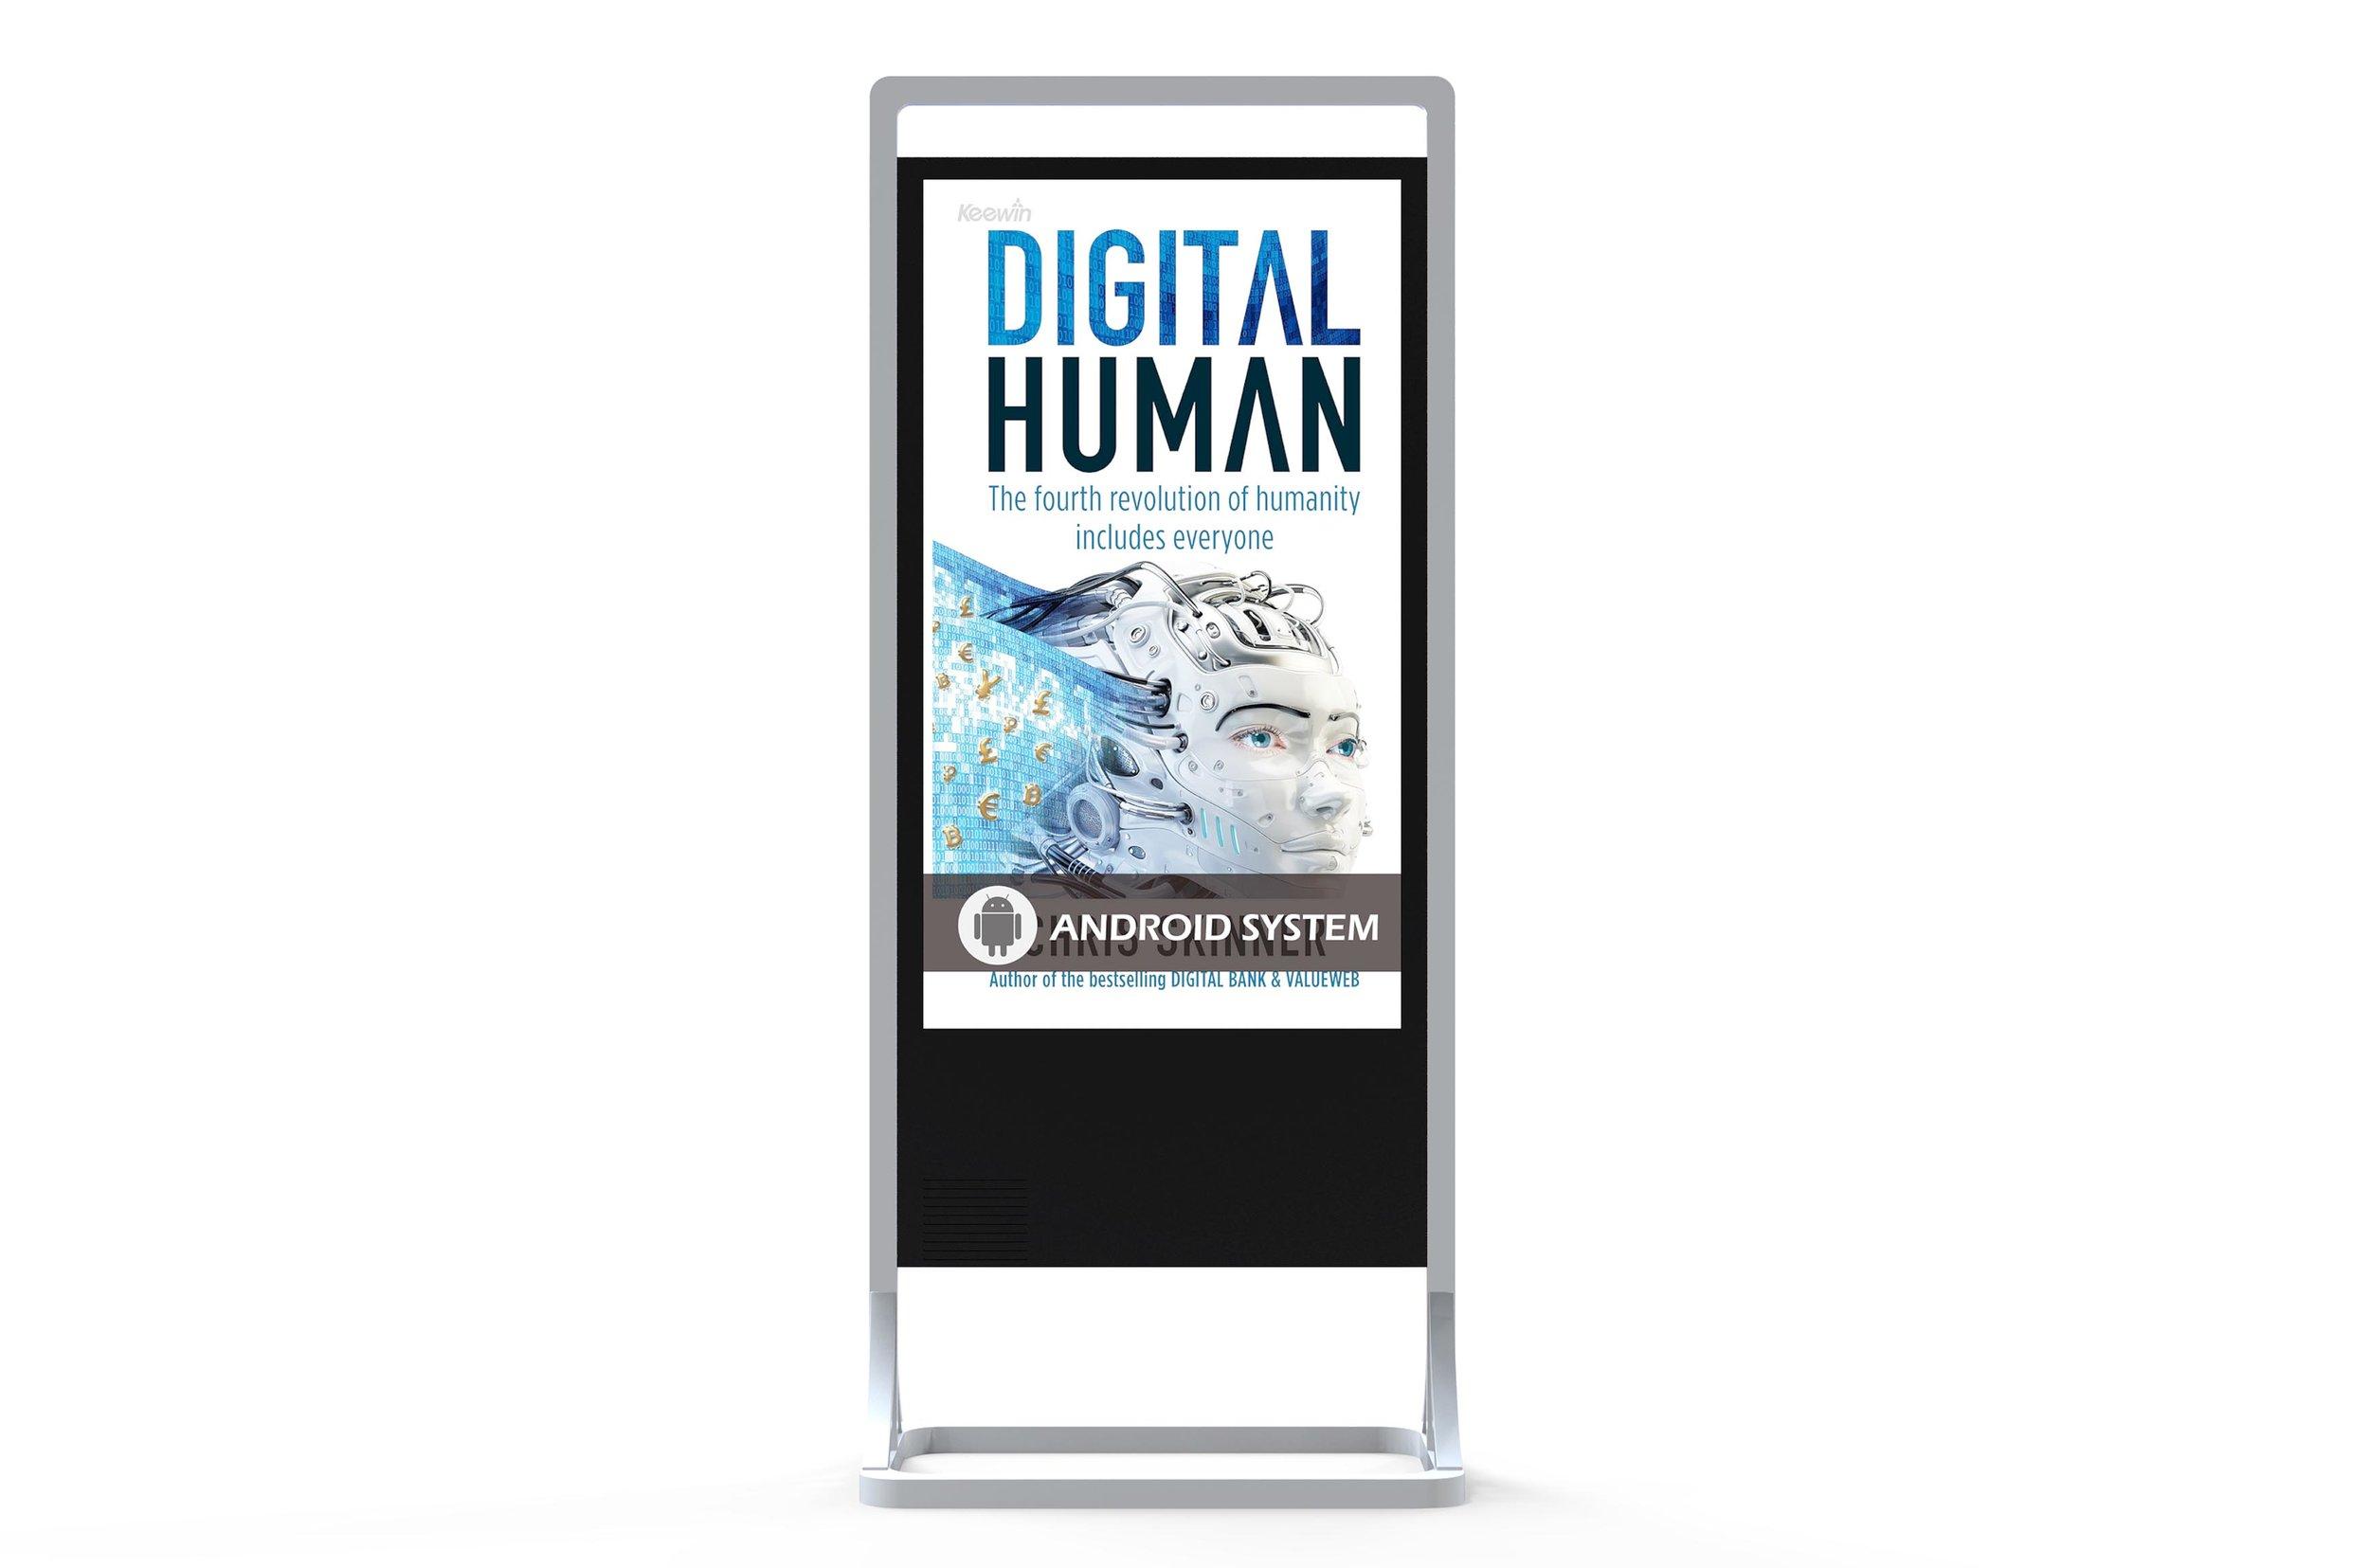 Keewin Display-double sided digital signage floorstanding -window display.jpg